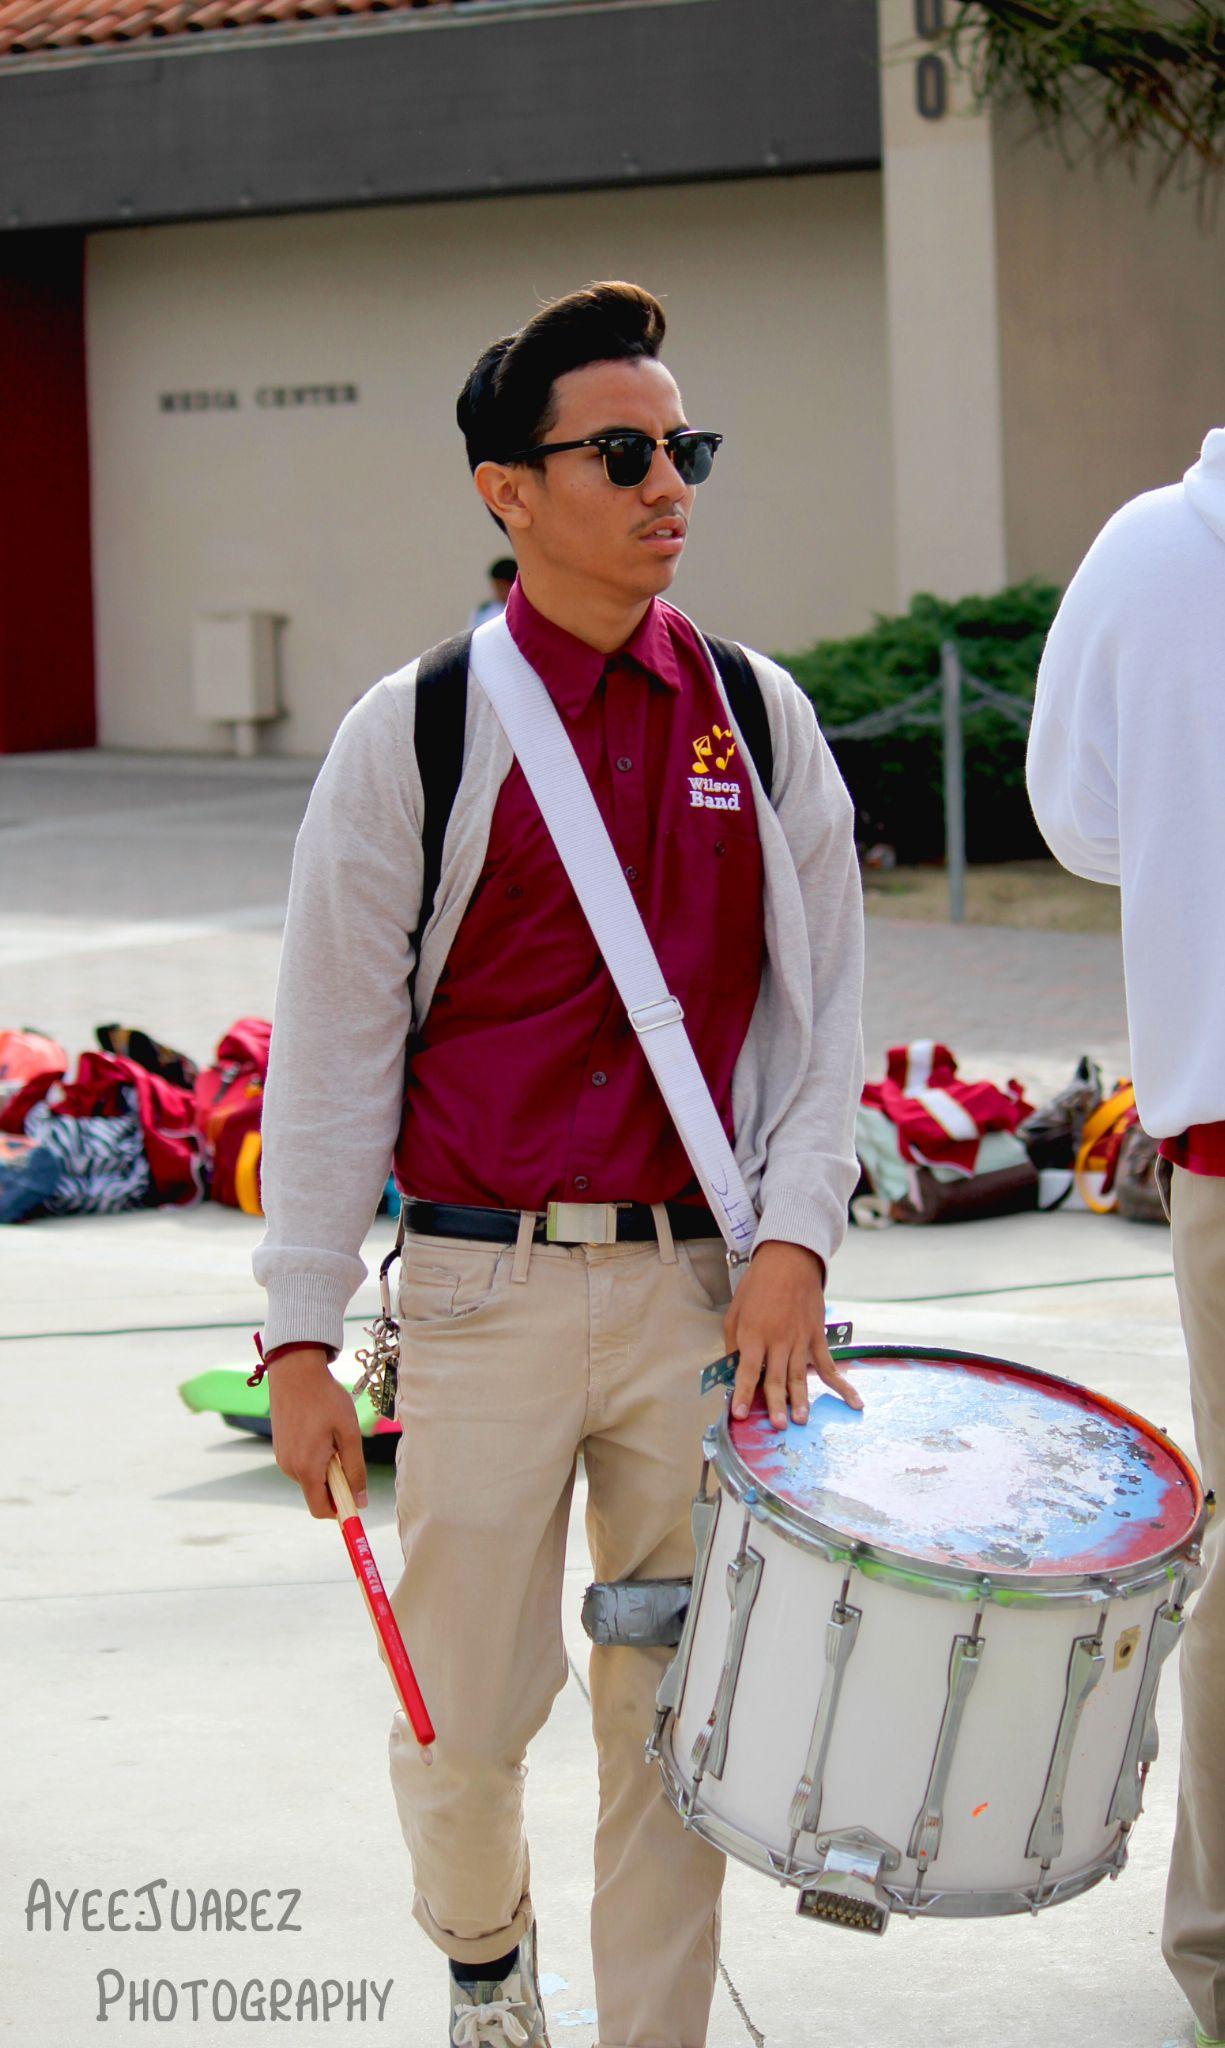 Drummer Boy by Andrew Juarez